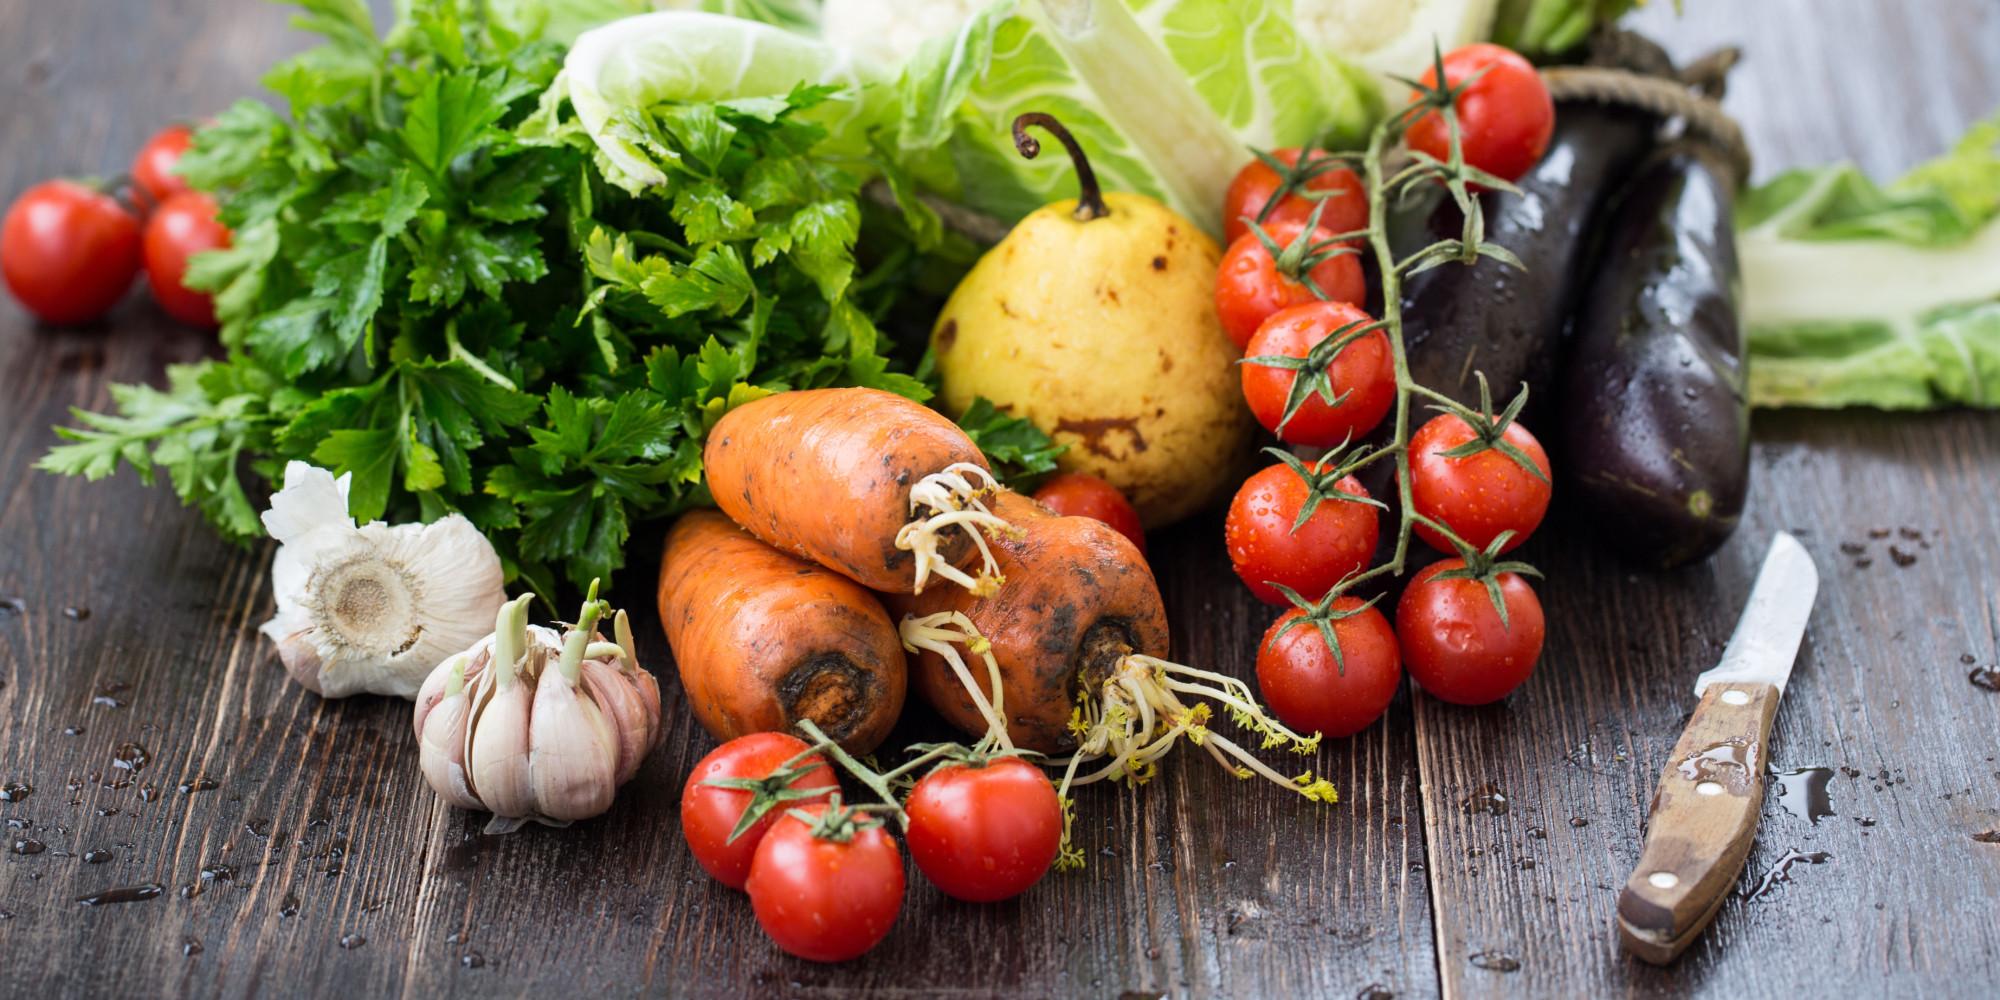 Fresh vegetables from farmers market